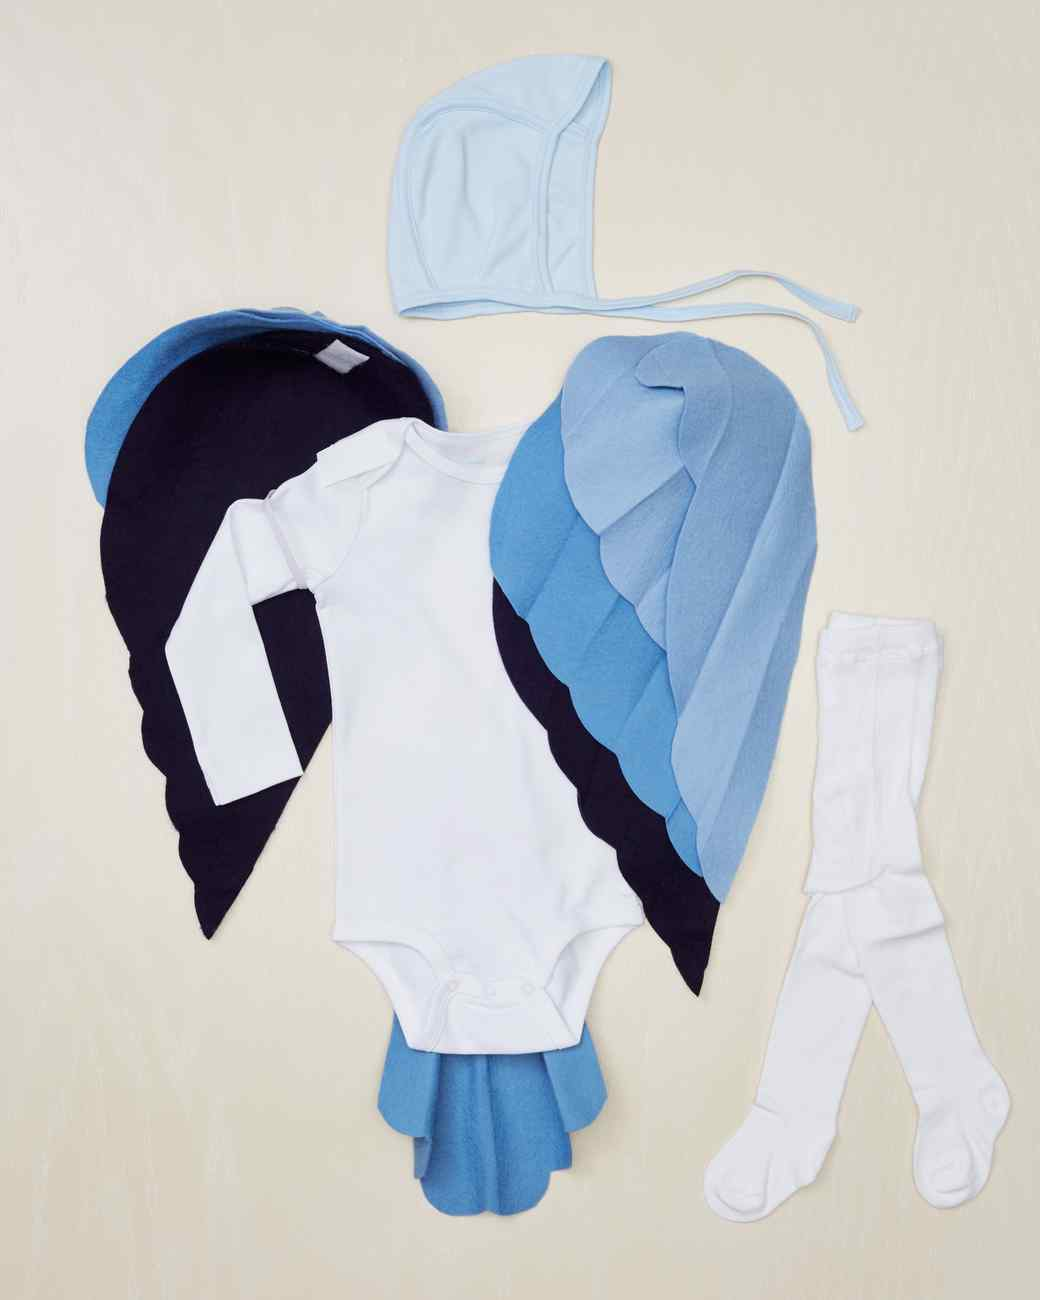 bluebird costume materials